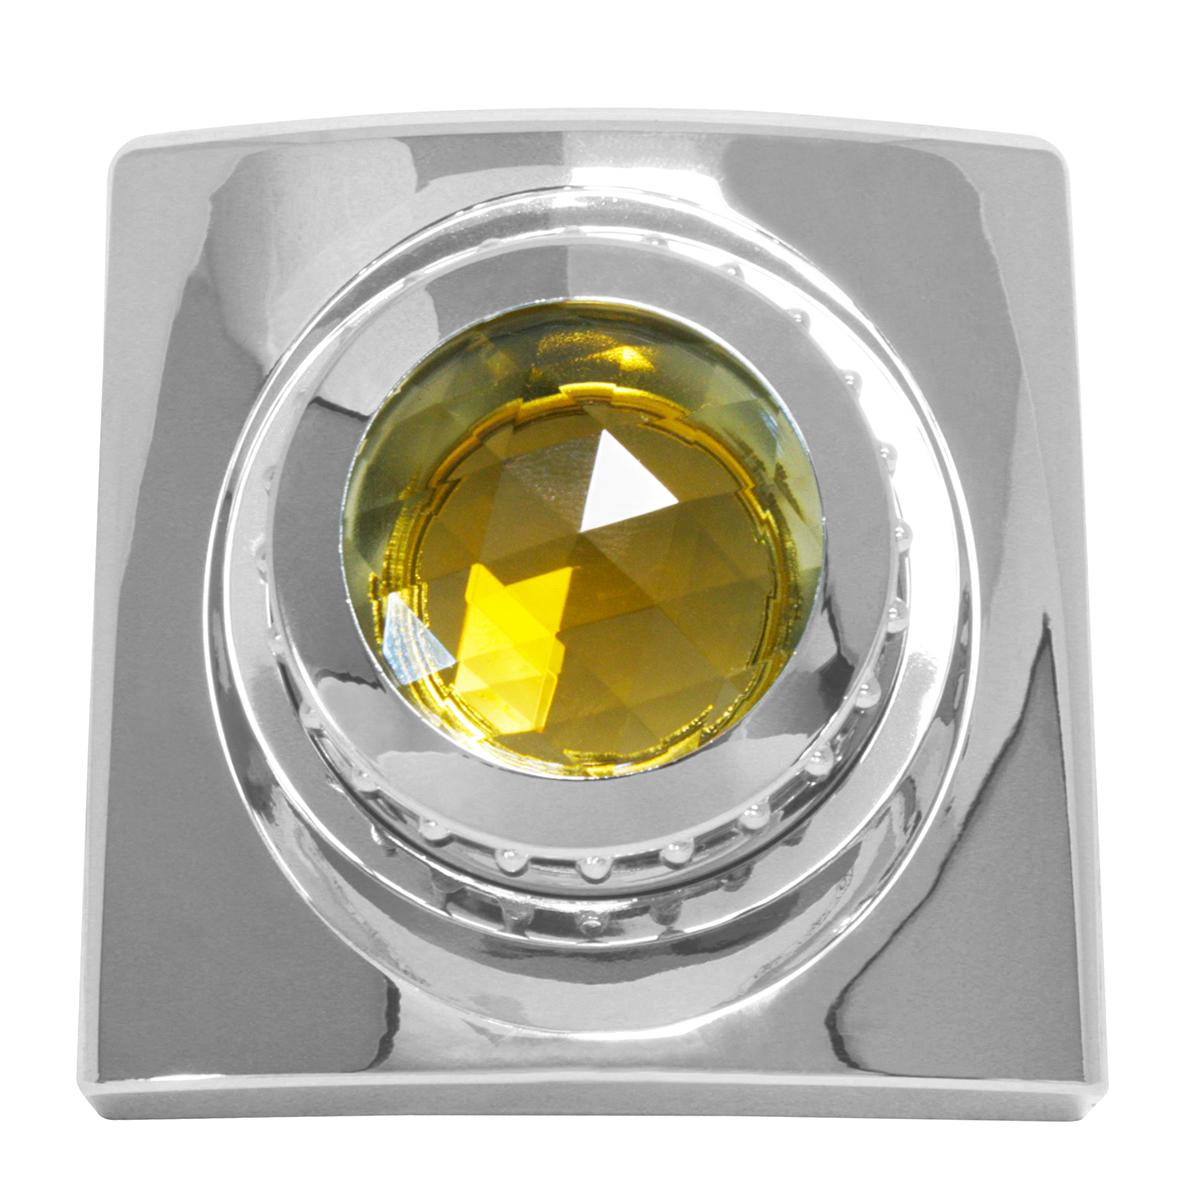 #68990 Chrome Die Cast Swivel Map Light Cover w/ Amber Glass